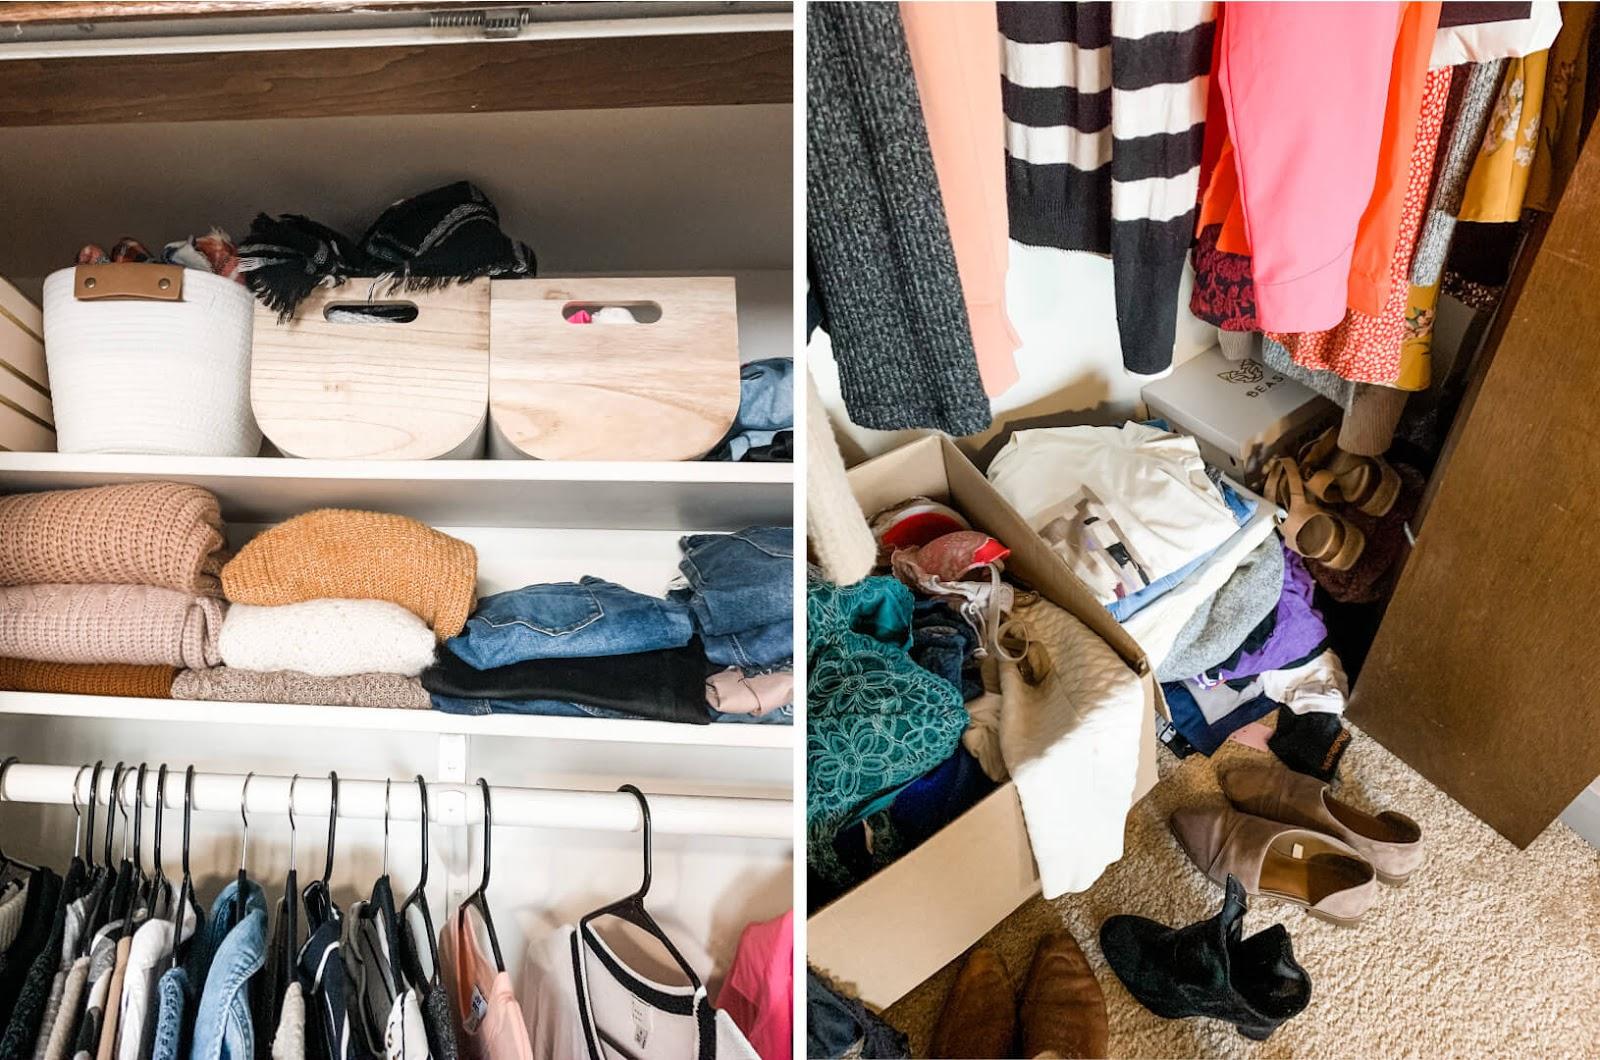 My bedroom closet before I organized it